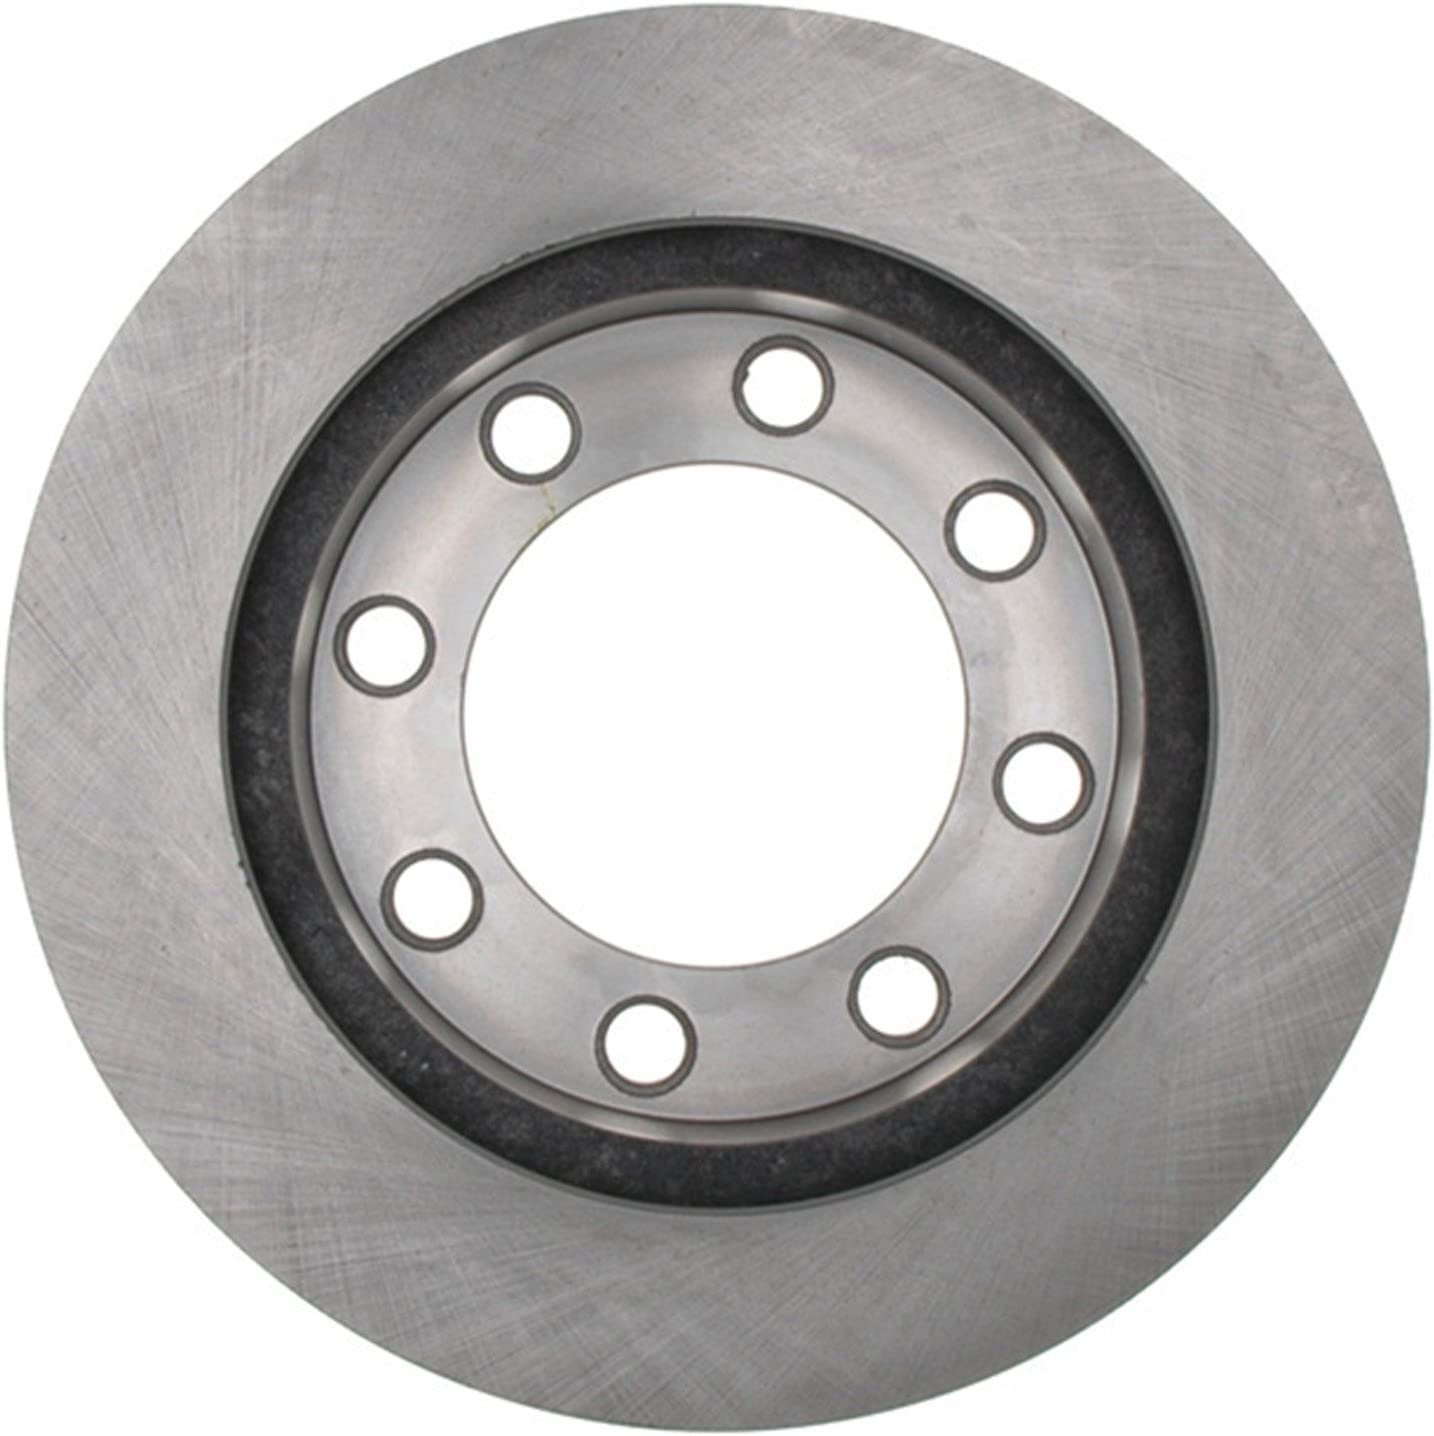 ACDelco 18A103A Advantage Non-Coated Front Disc Brake Rotor